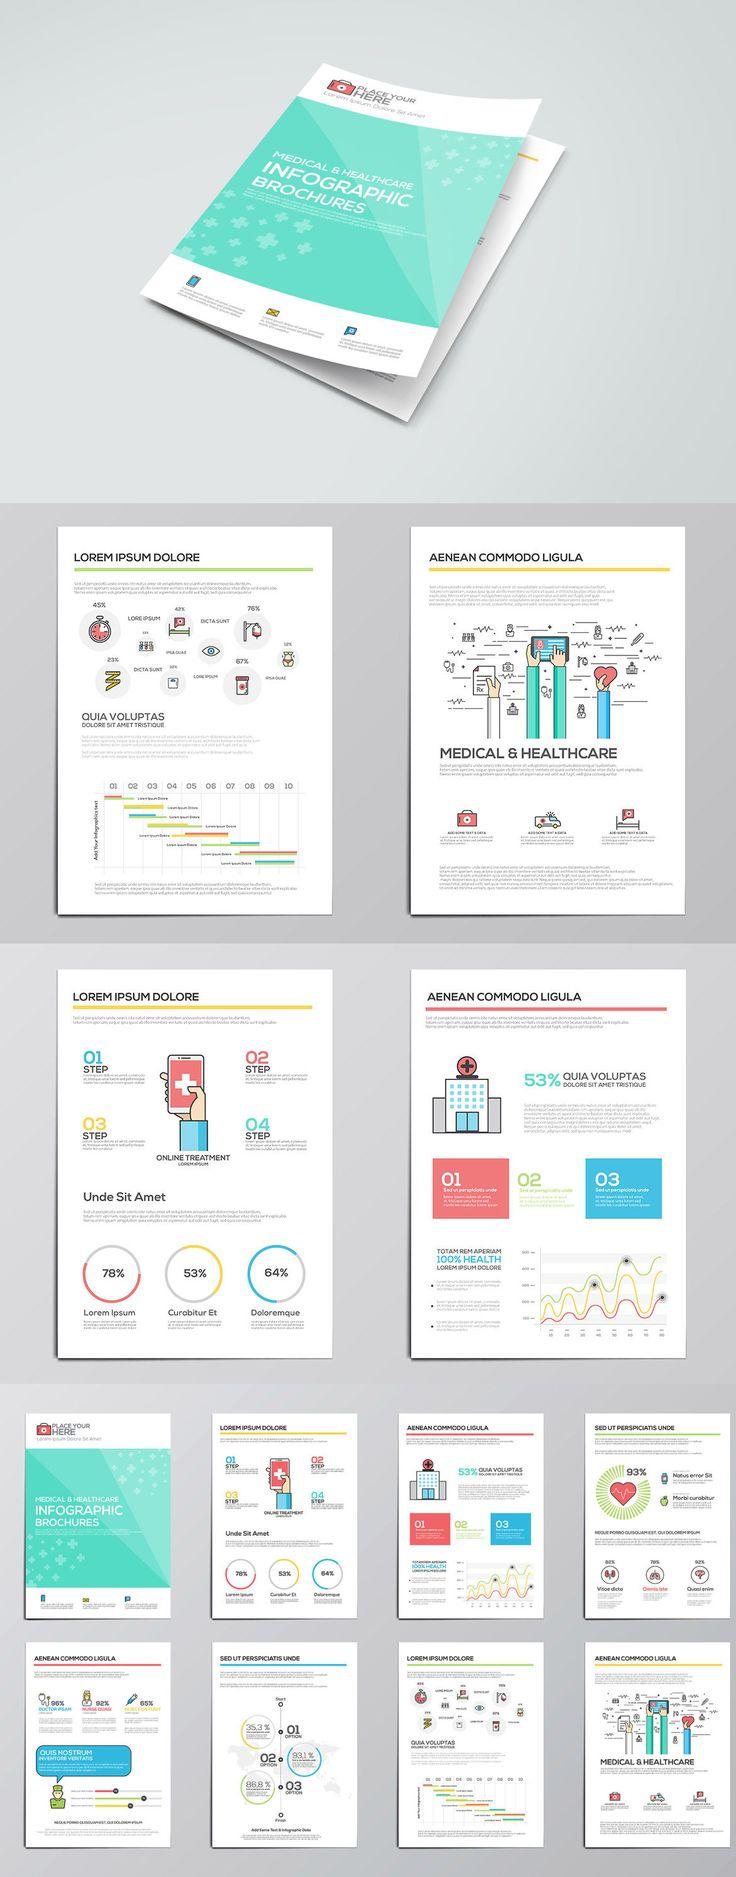 Medical Infographics Elements For Brochures